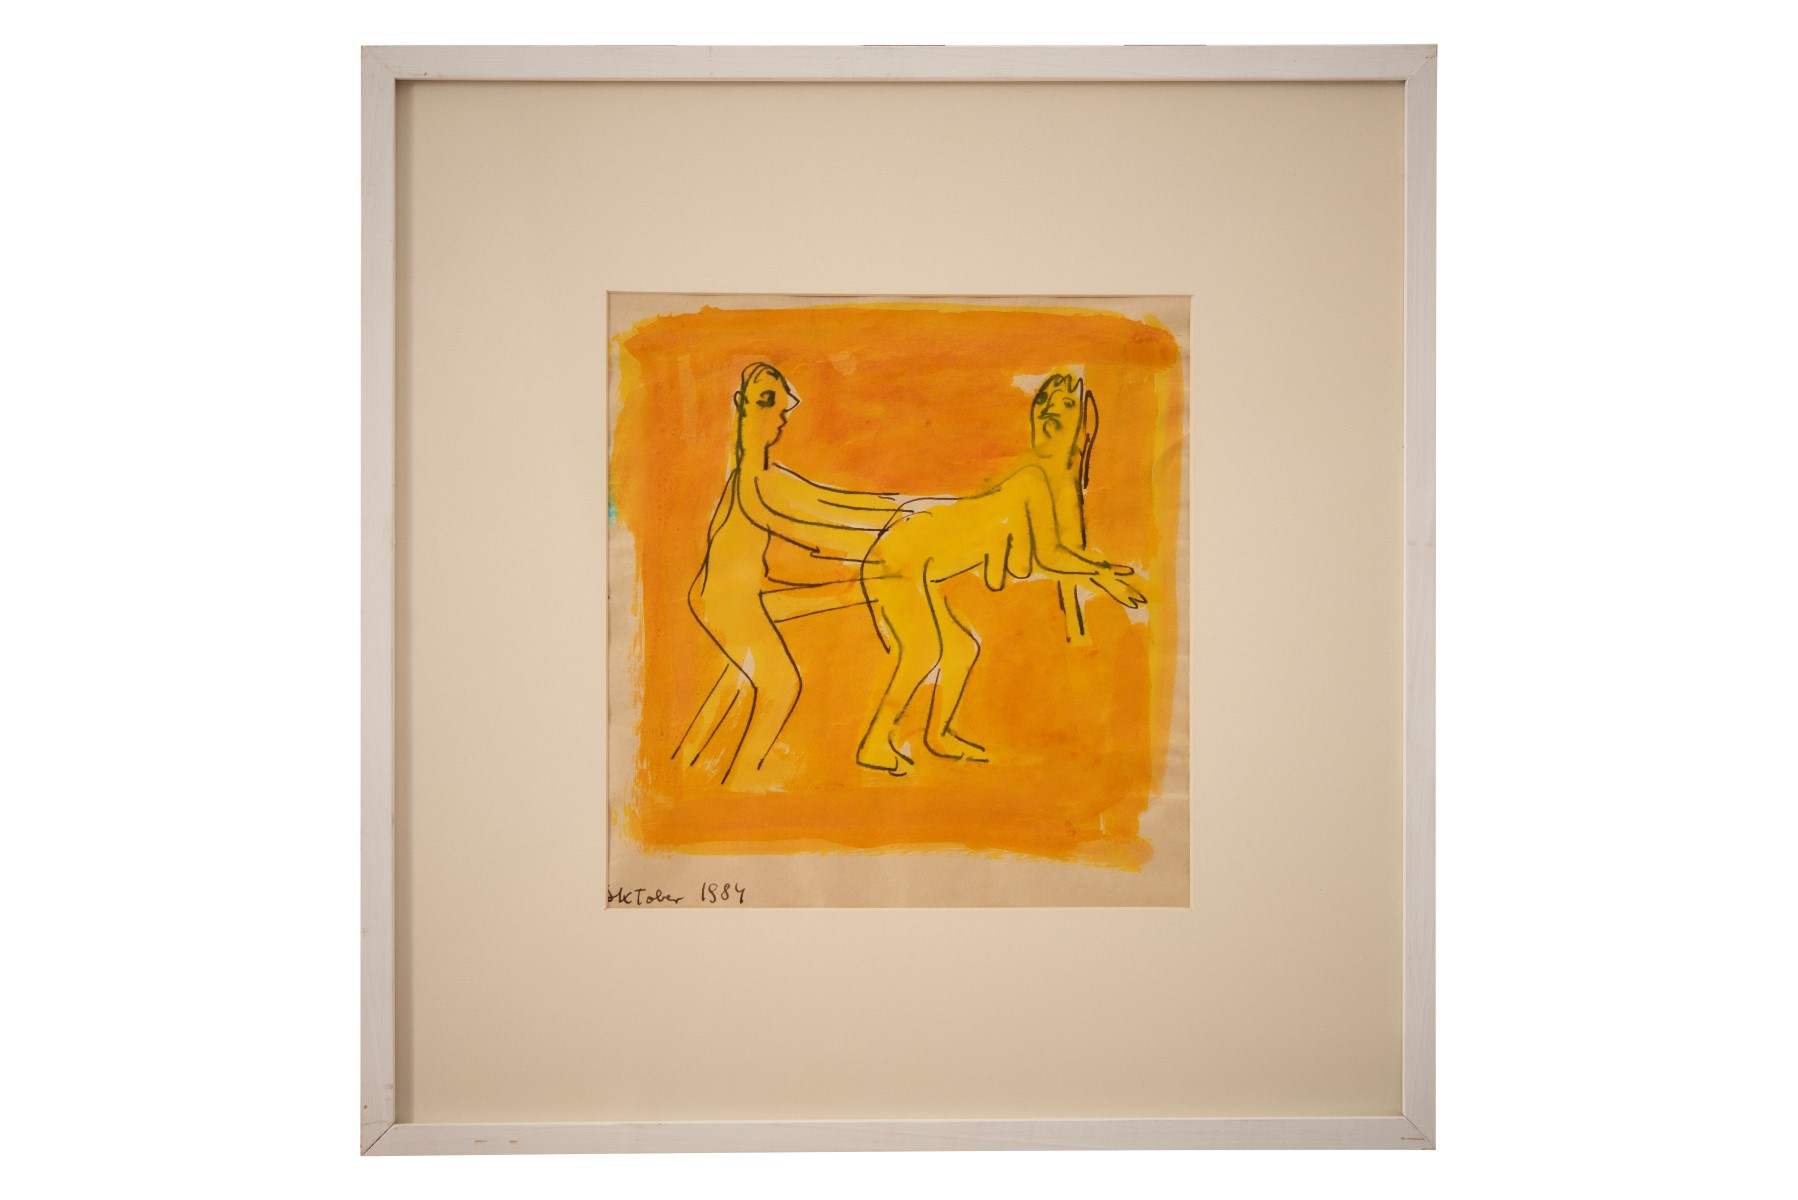 #116 Otto Mühl* (1925-2013), Act of love, 1984   Otto Mühl* (1925-2013), Liebesakt, 1984 Image